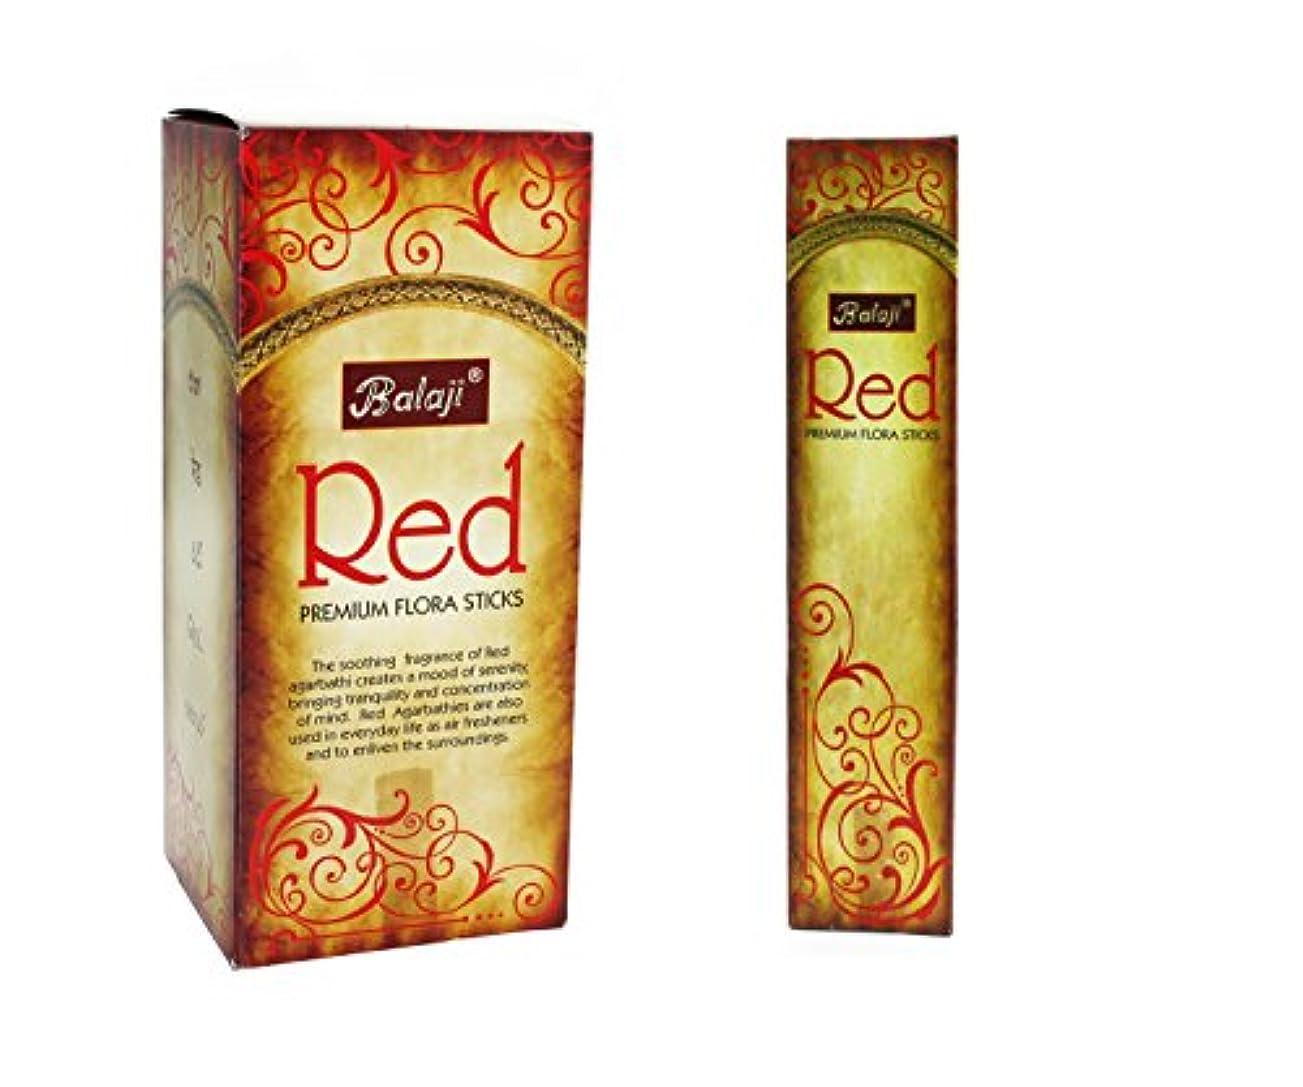 展示会カーテン法律Balaji Red Premium Flora Sticks (Incense/Joss Sticks/ Agarbatti) (12 units x 15 Sticks) by Balaji